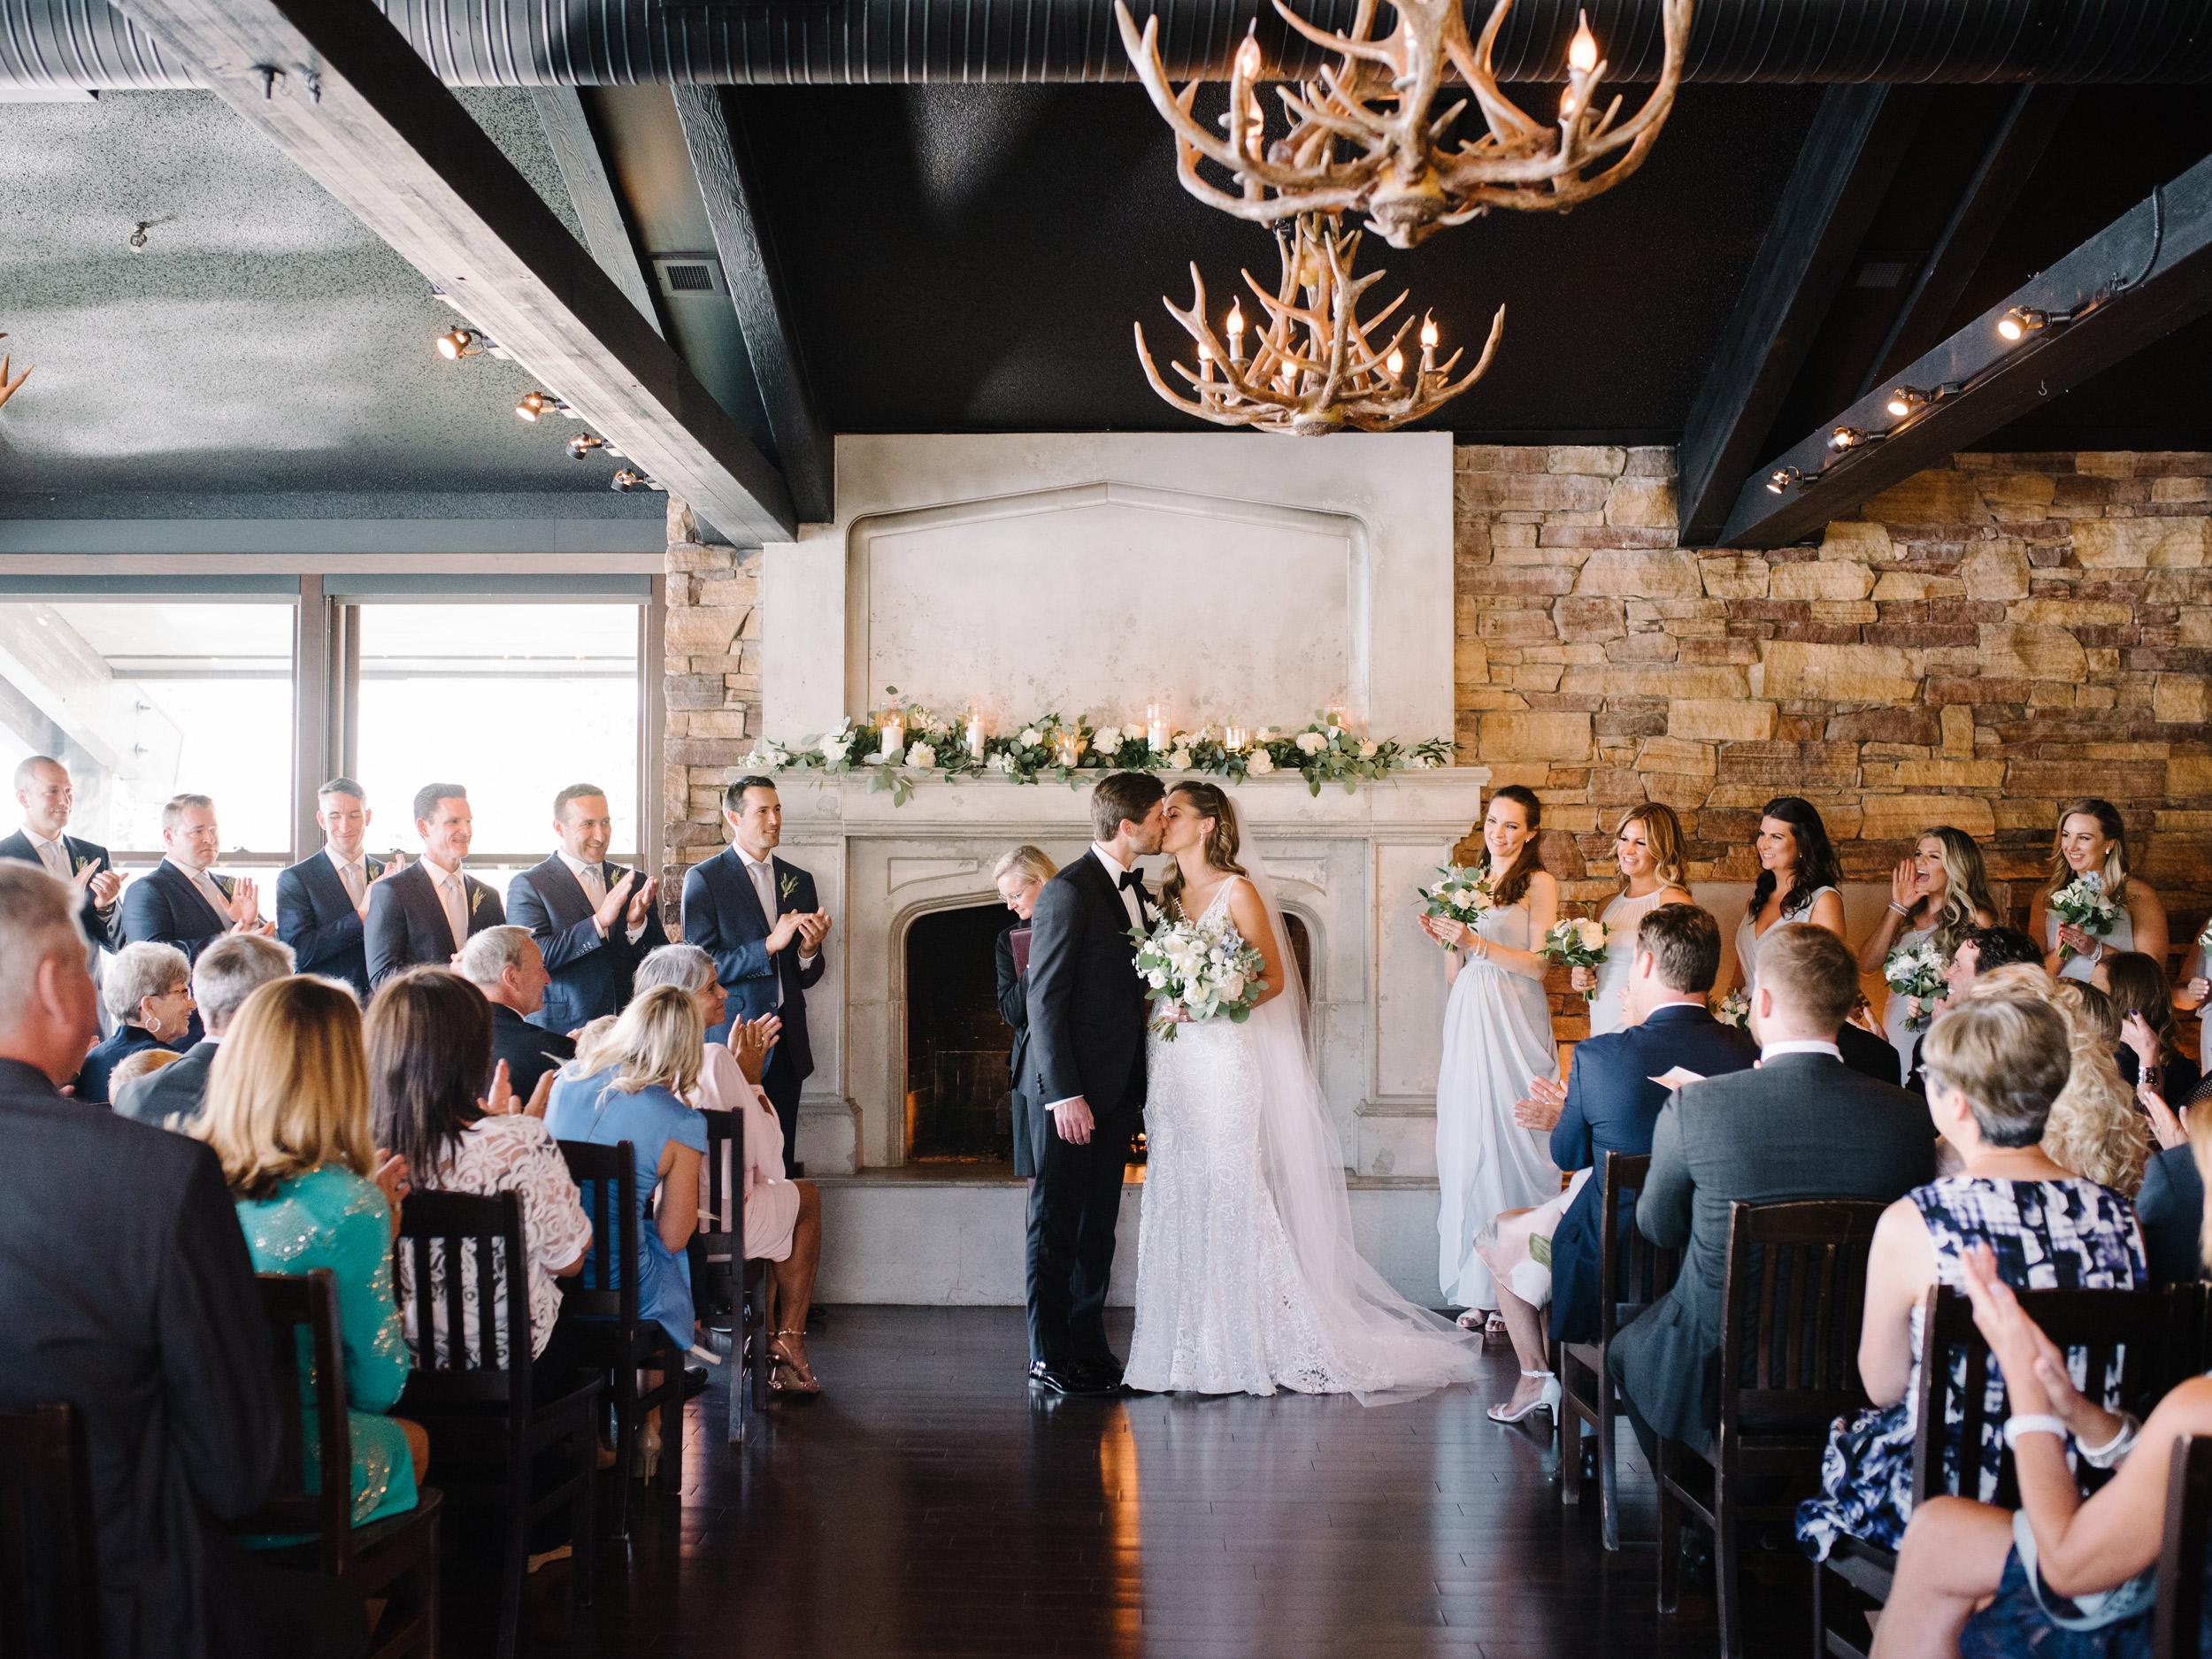 065-The_Lake_House_Calgary_Wedding.jpg